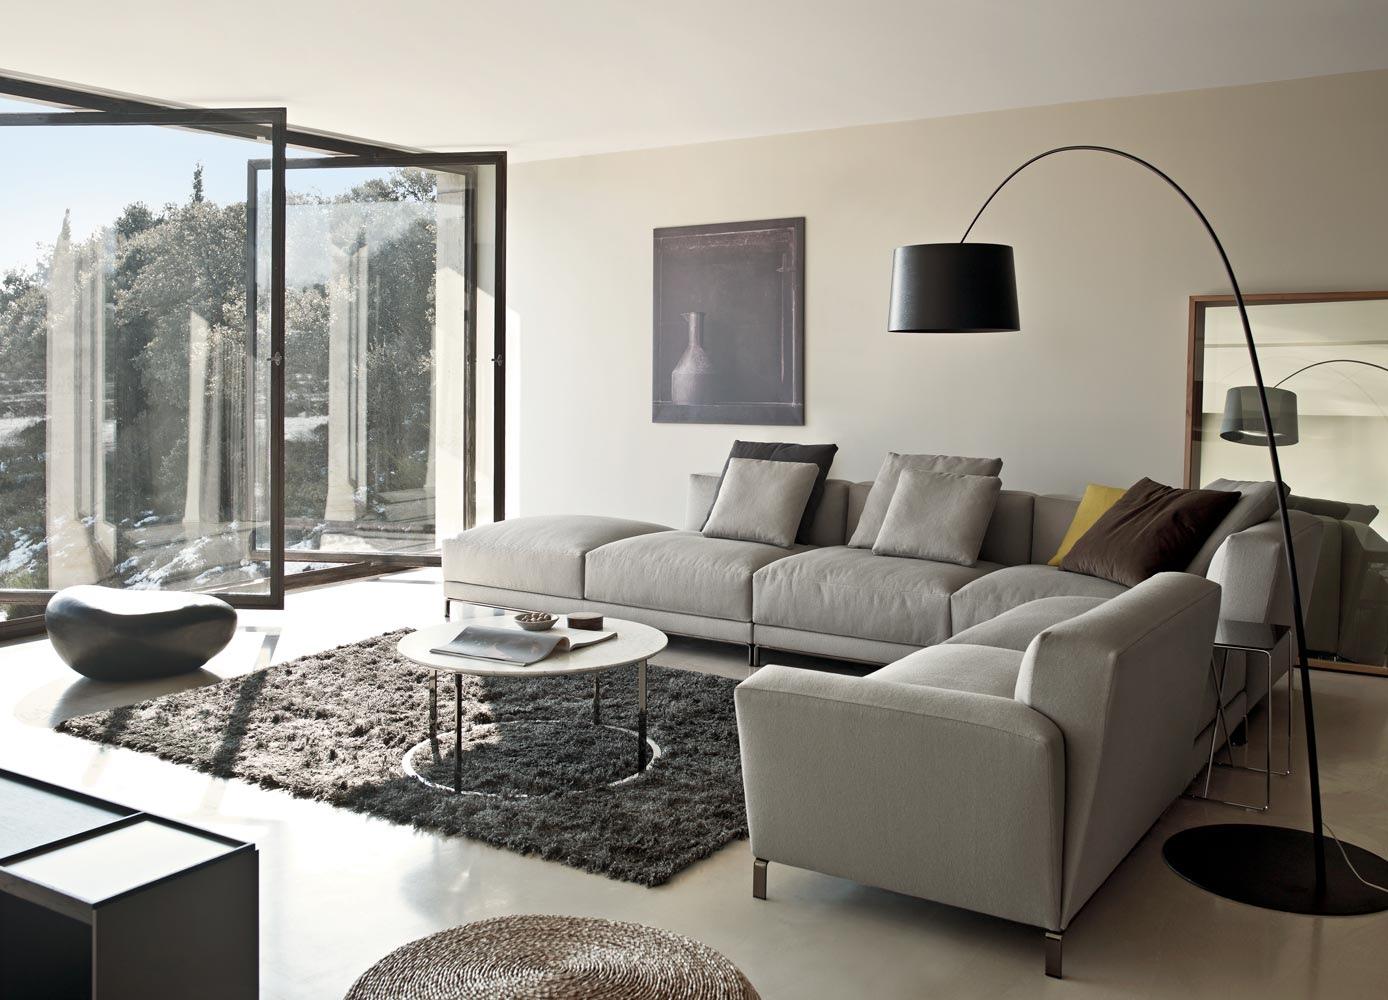 grey sectional sofa ideas robin day habitat bed gray interior design